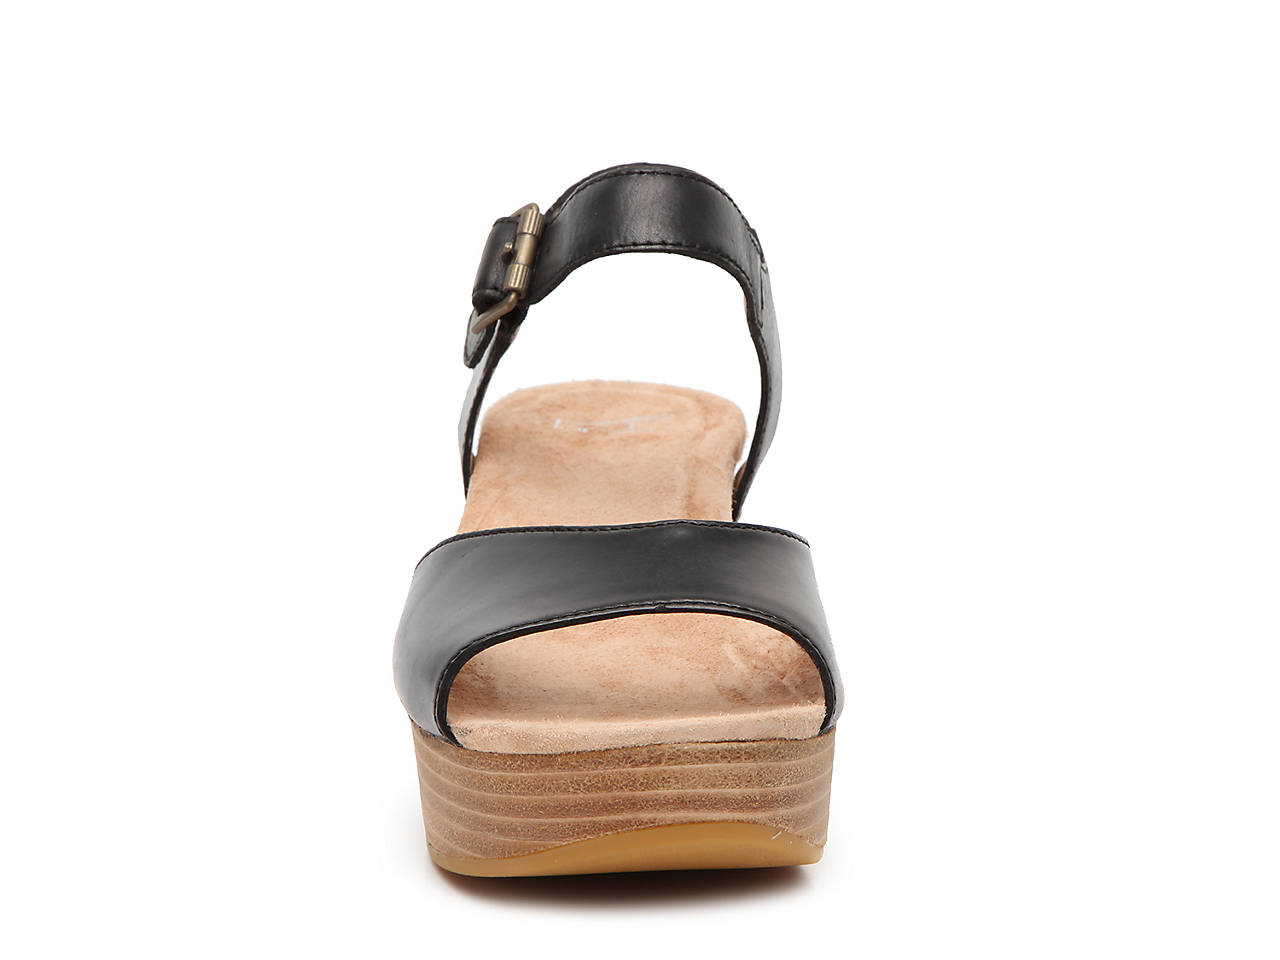 753ea5954440 Dansko Silvie Wedge Sandal Women s Shoes